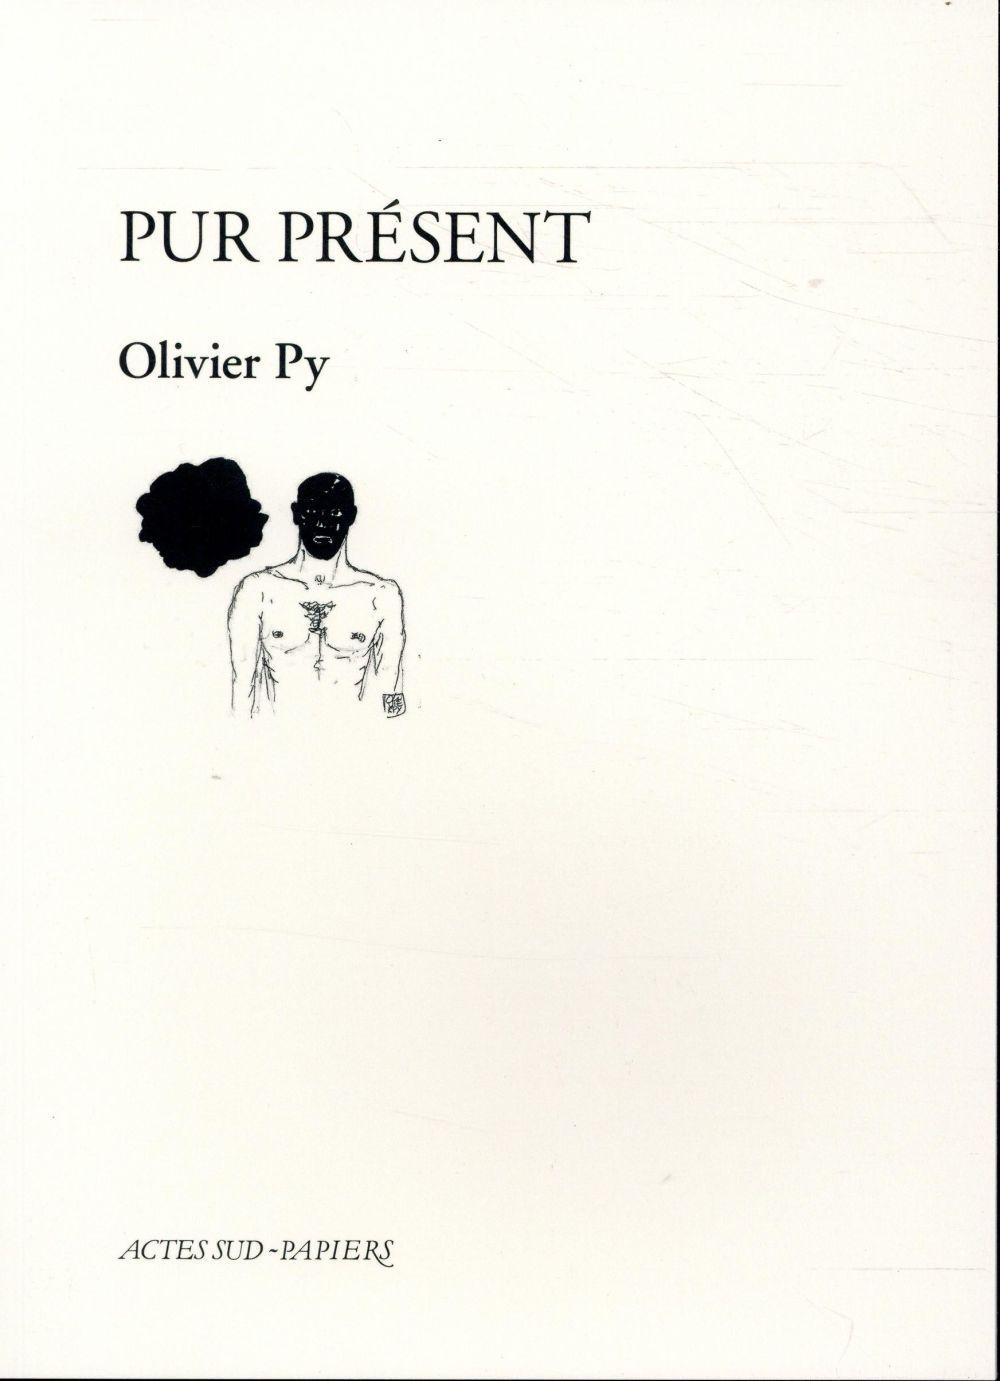 PUR PRESENT PY OLIVIER ACTES SUD